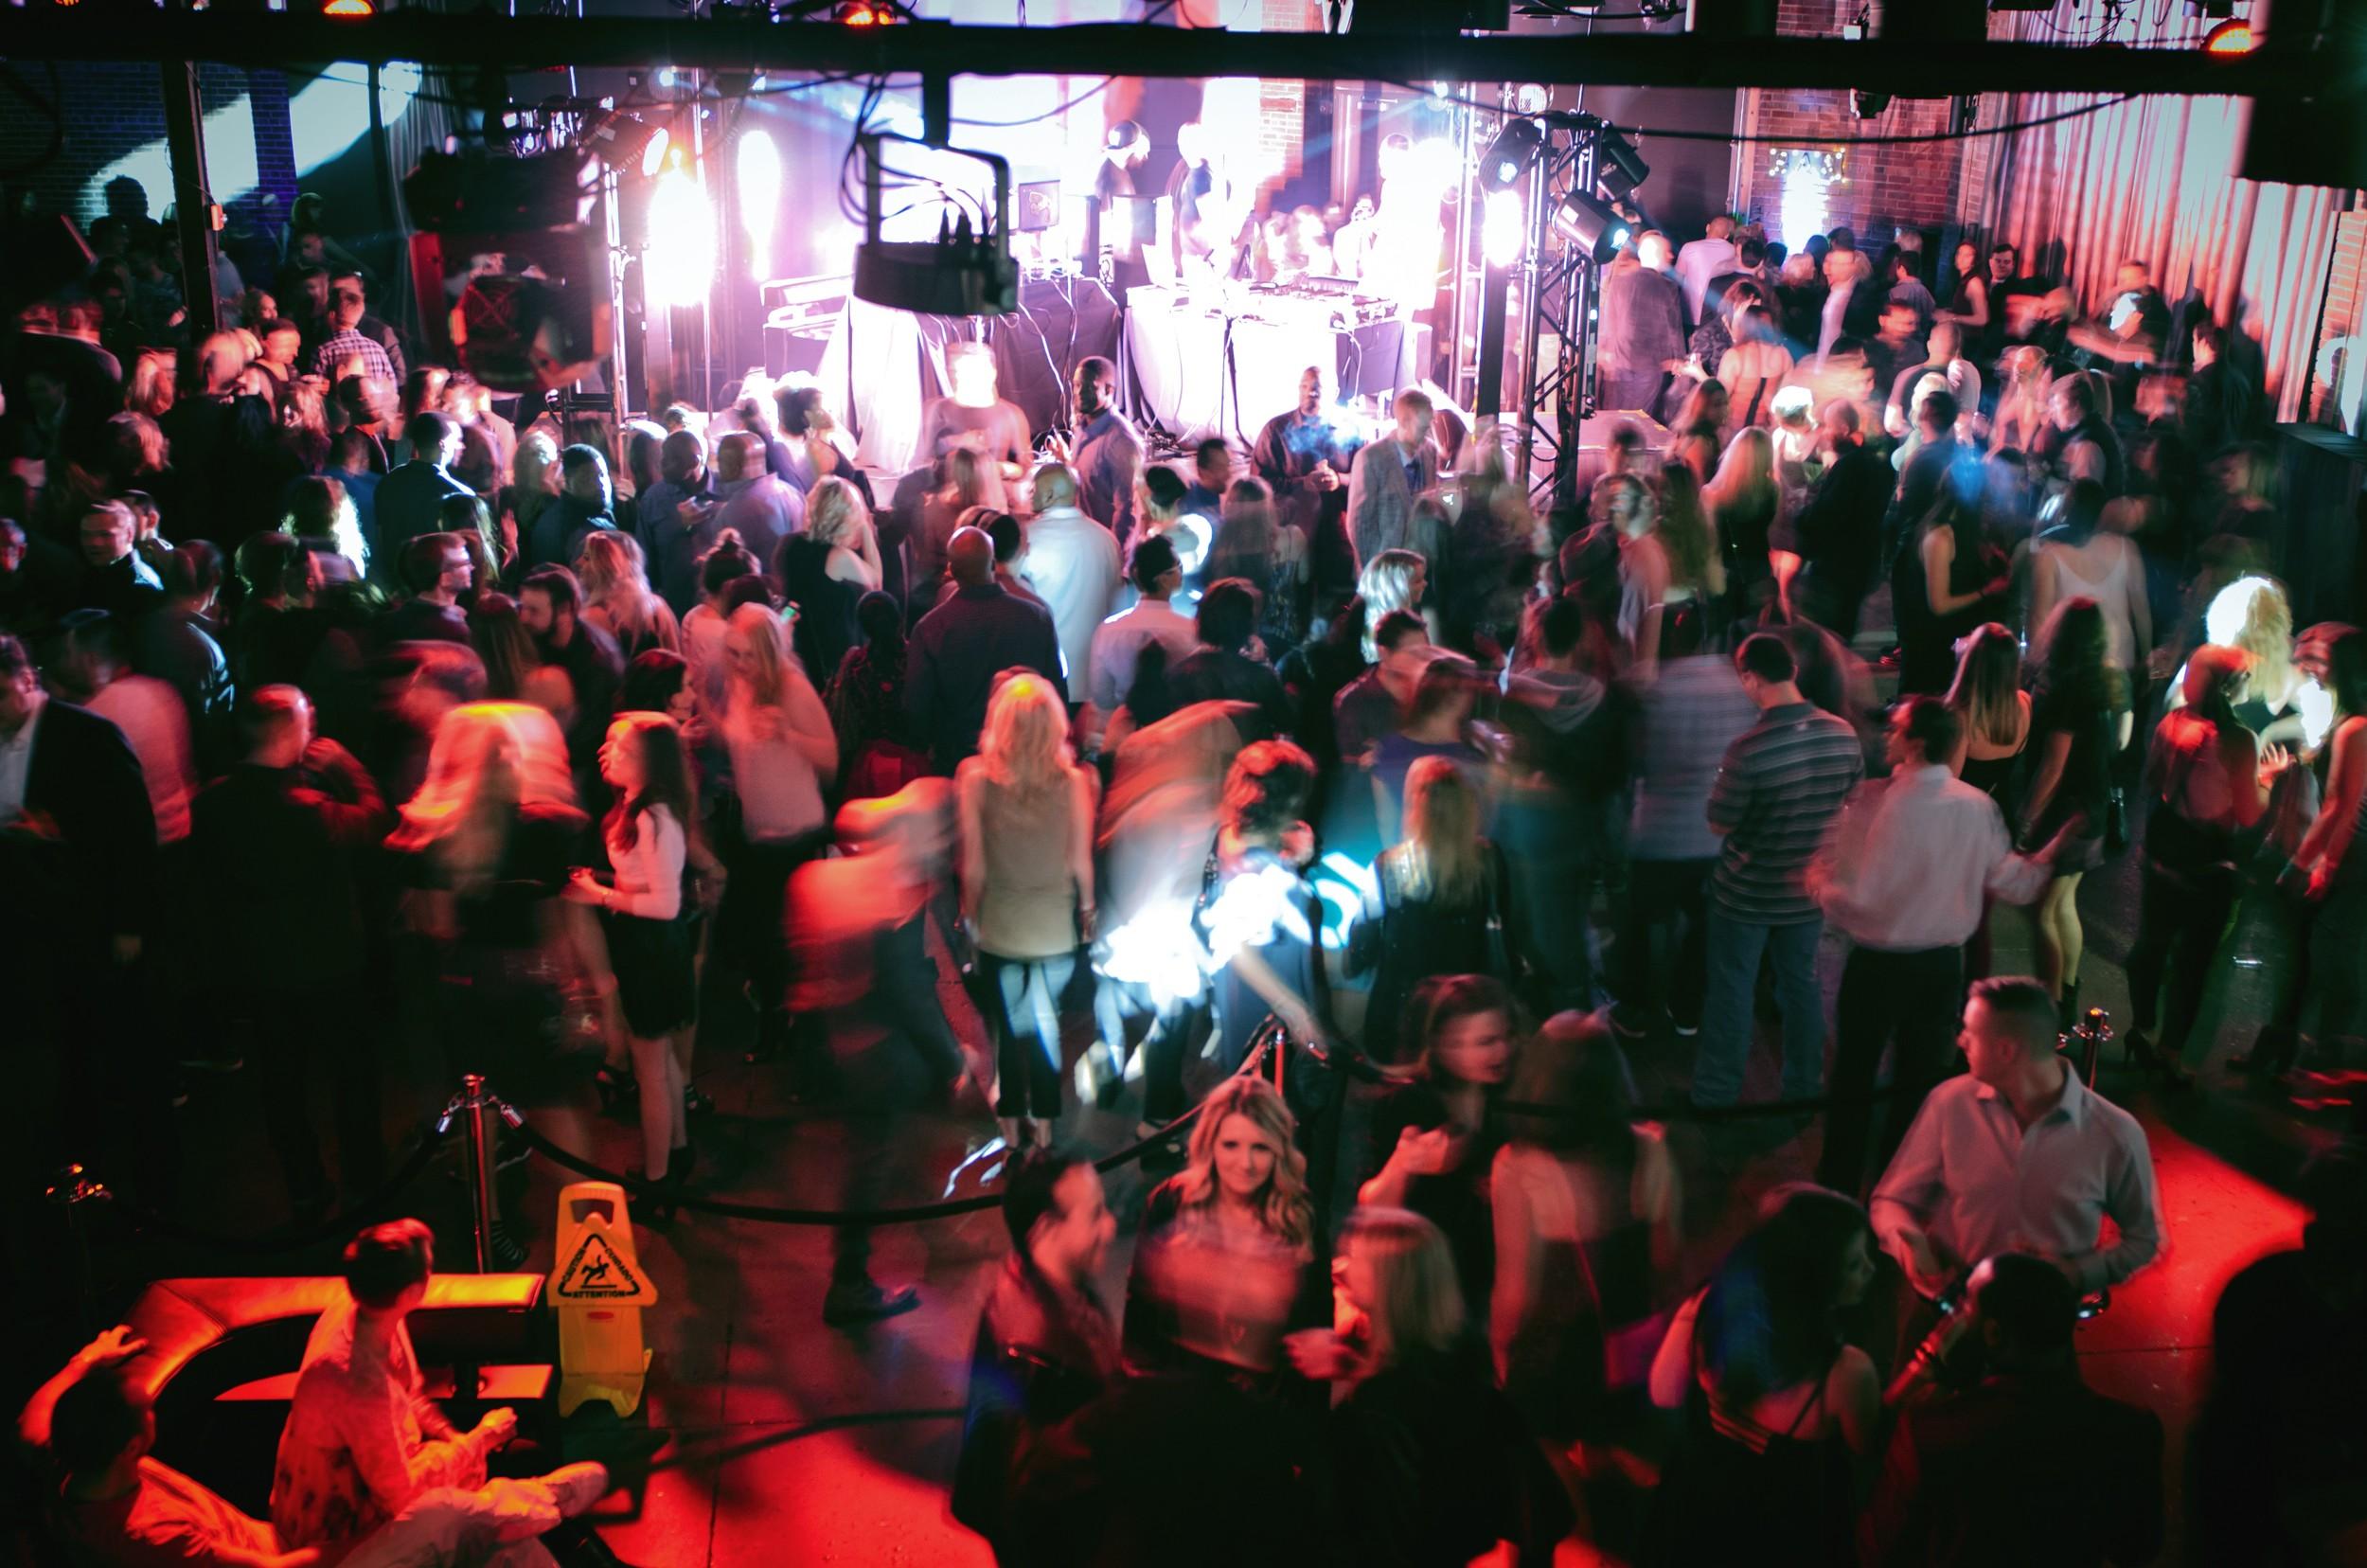 A bird's eye view of Saturday night's club scene